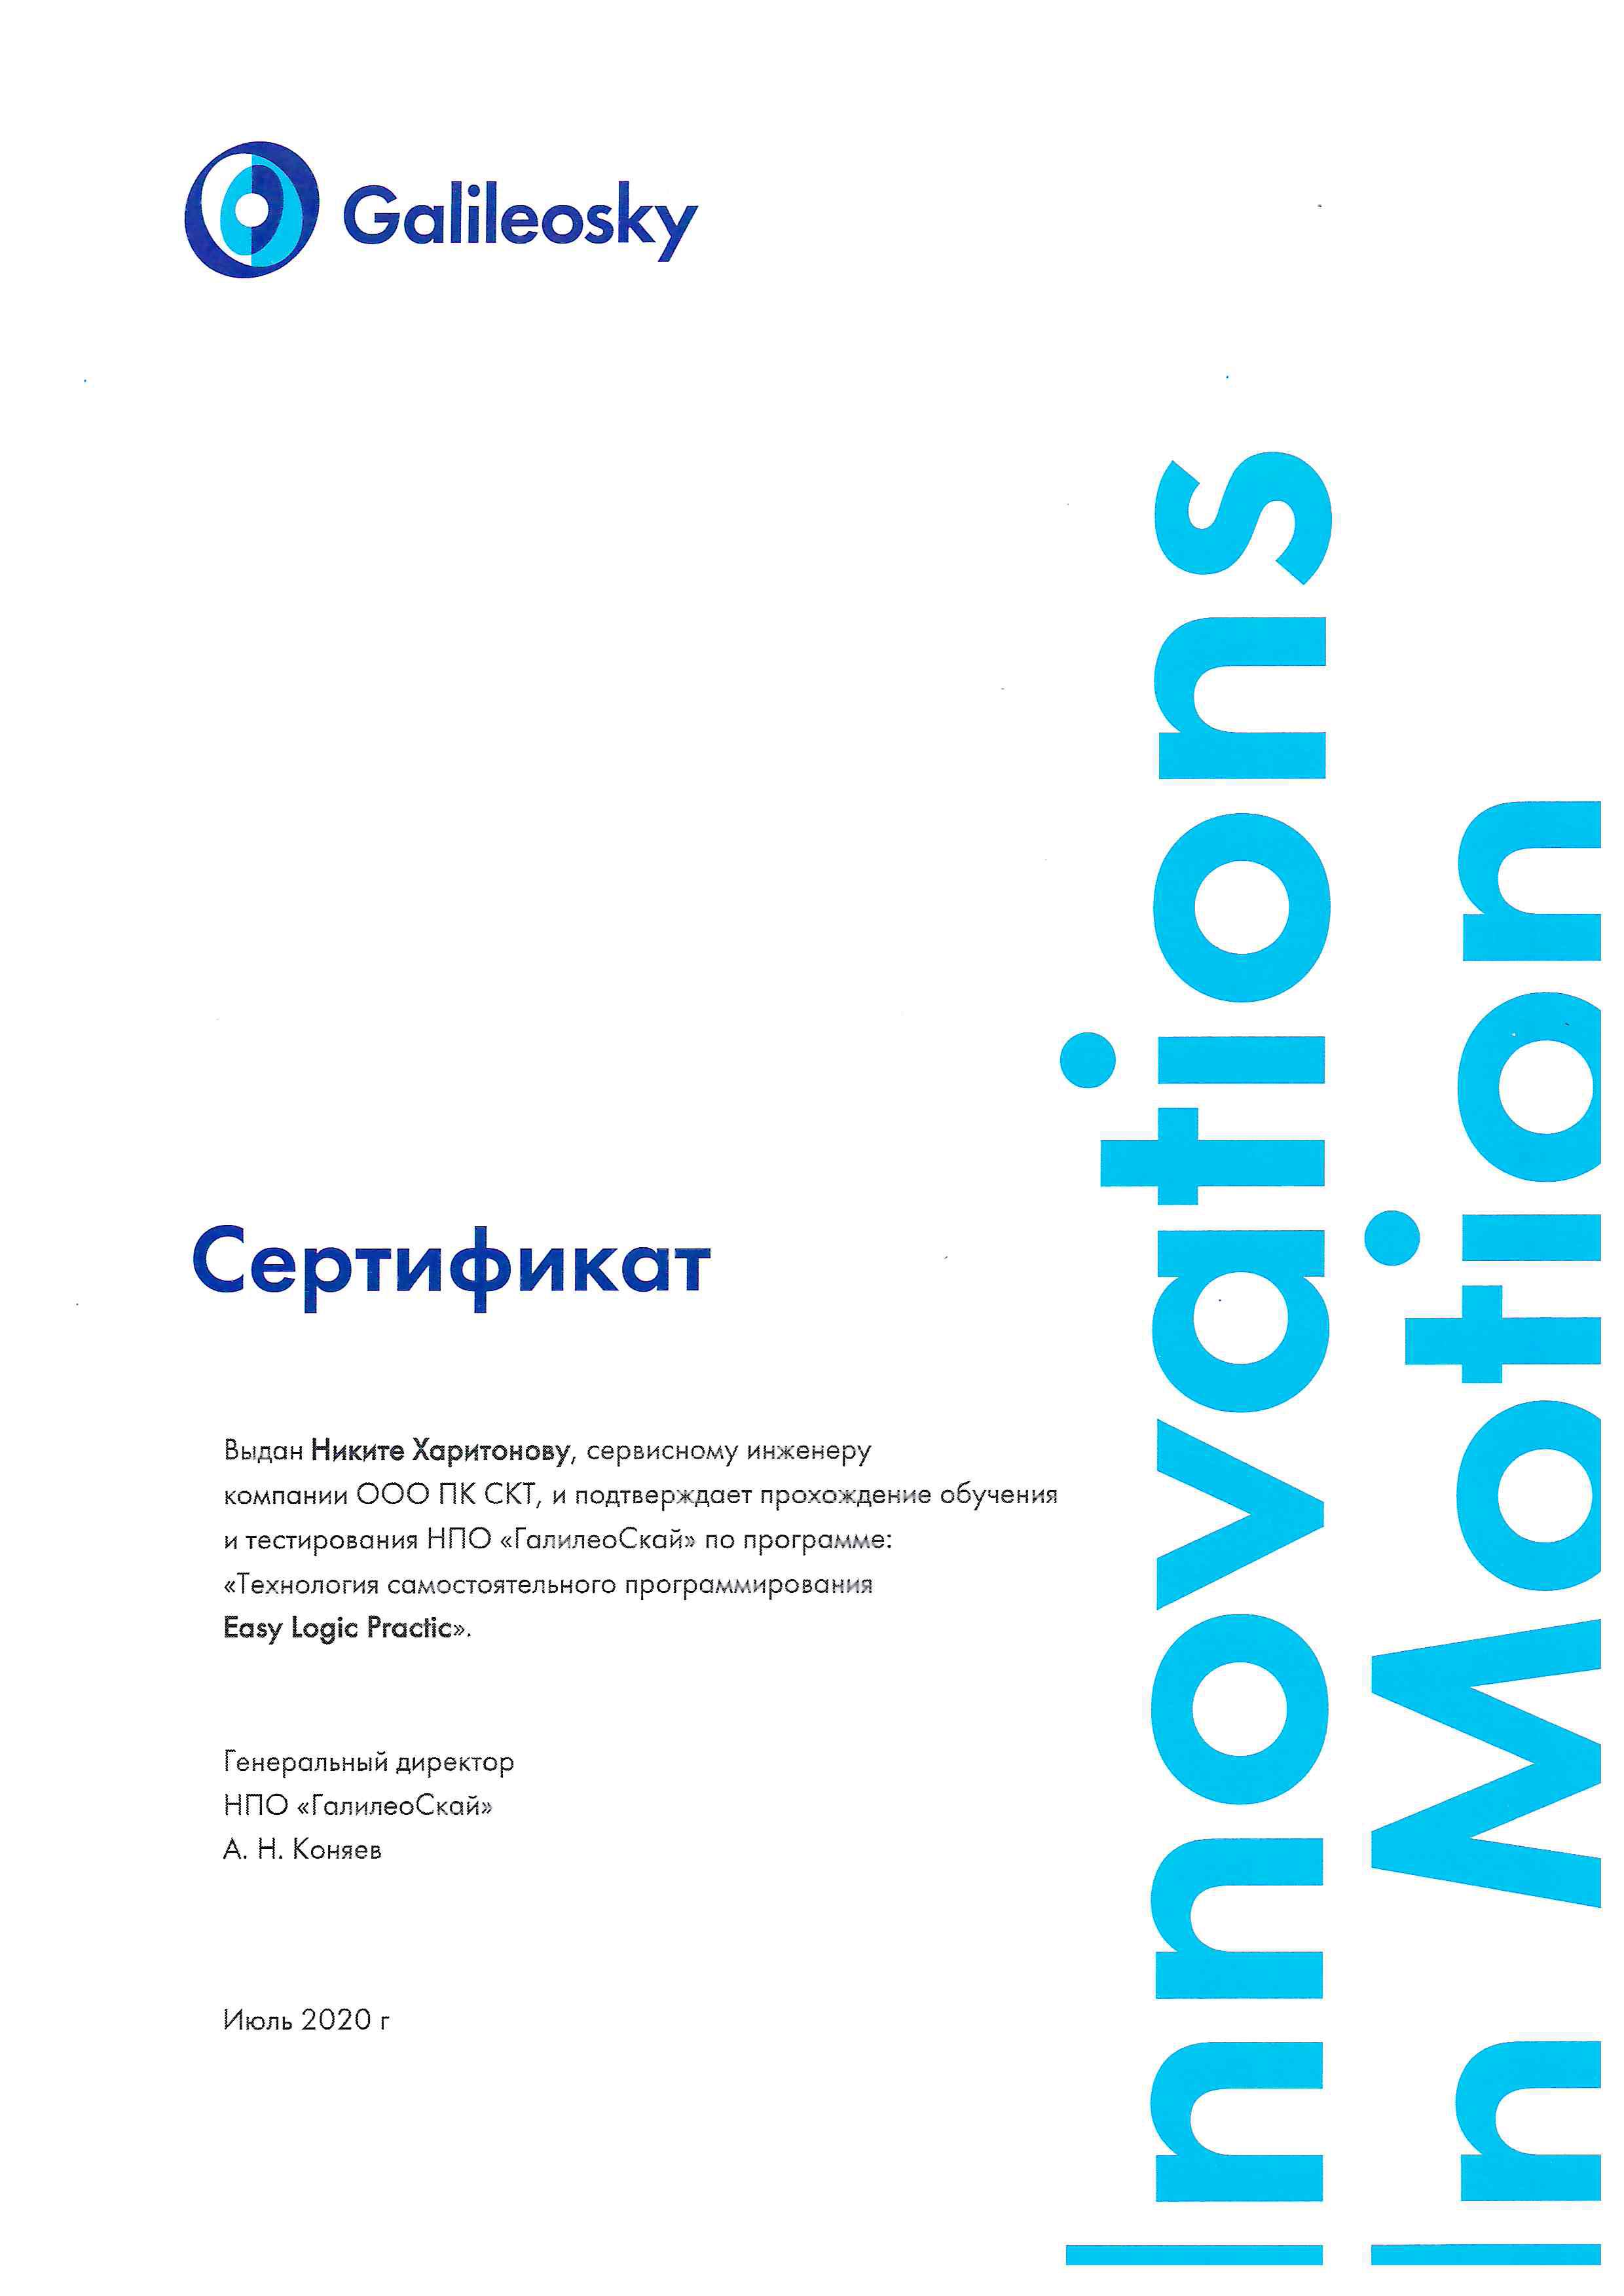 Сертификат Харитонова Н.